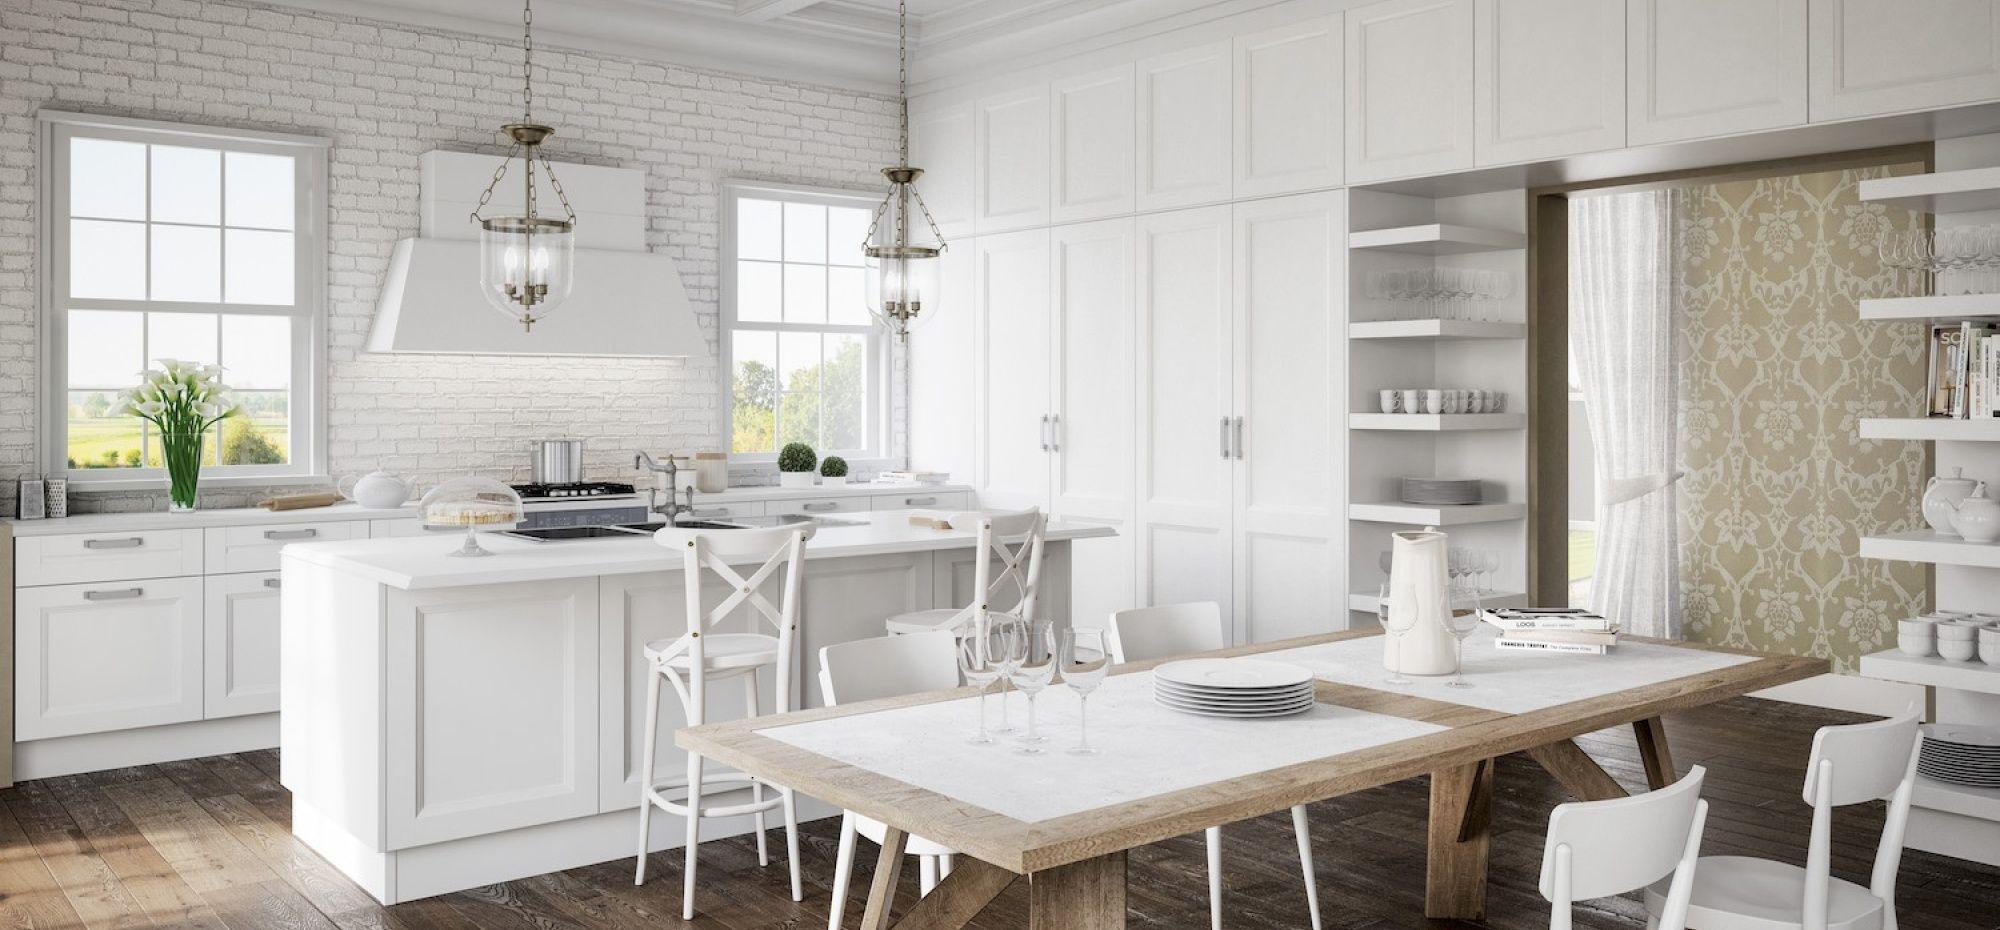 Camere Da Letto Moderne Berloni.Ginevra Progetti Di Cucine Cucine Moderne Berloni